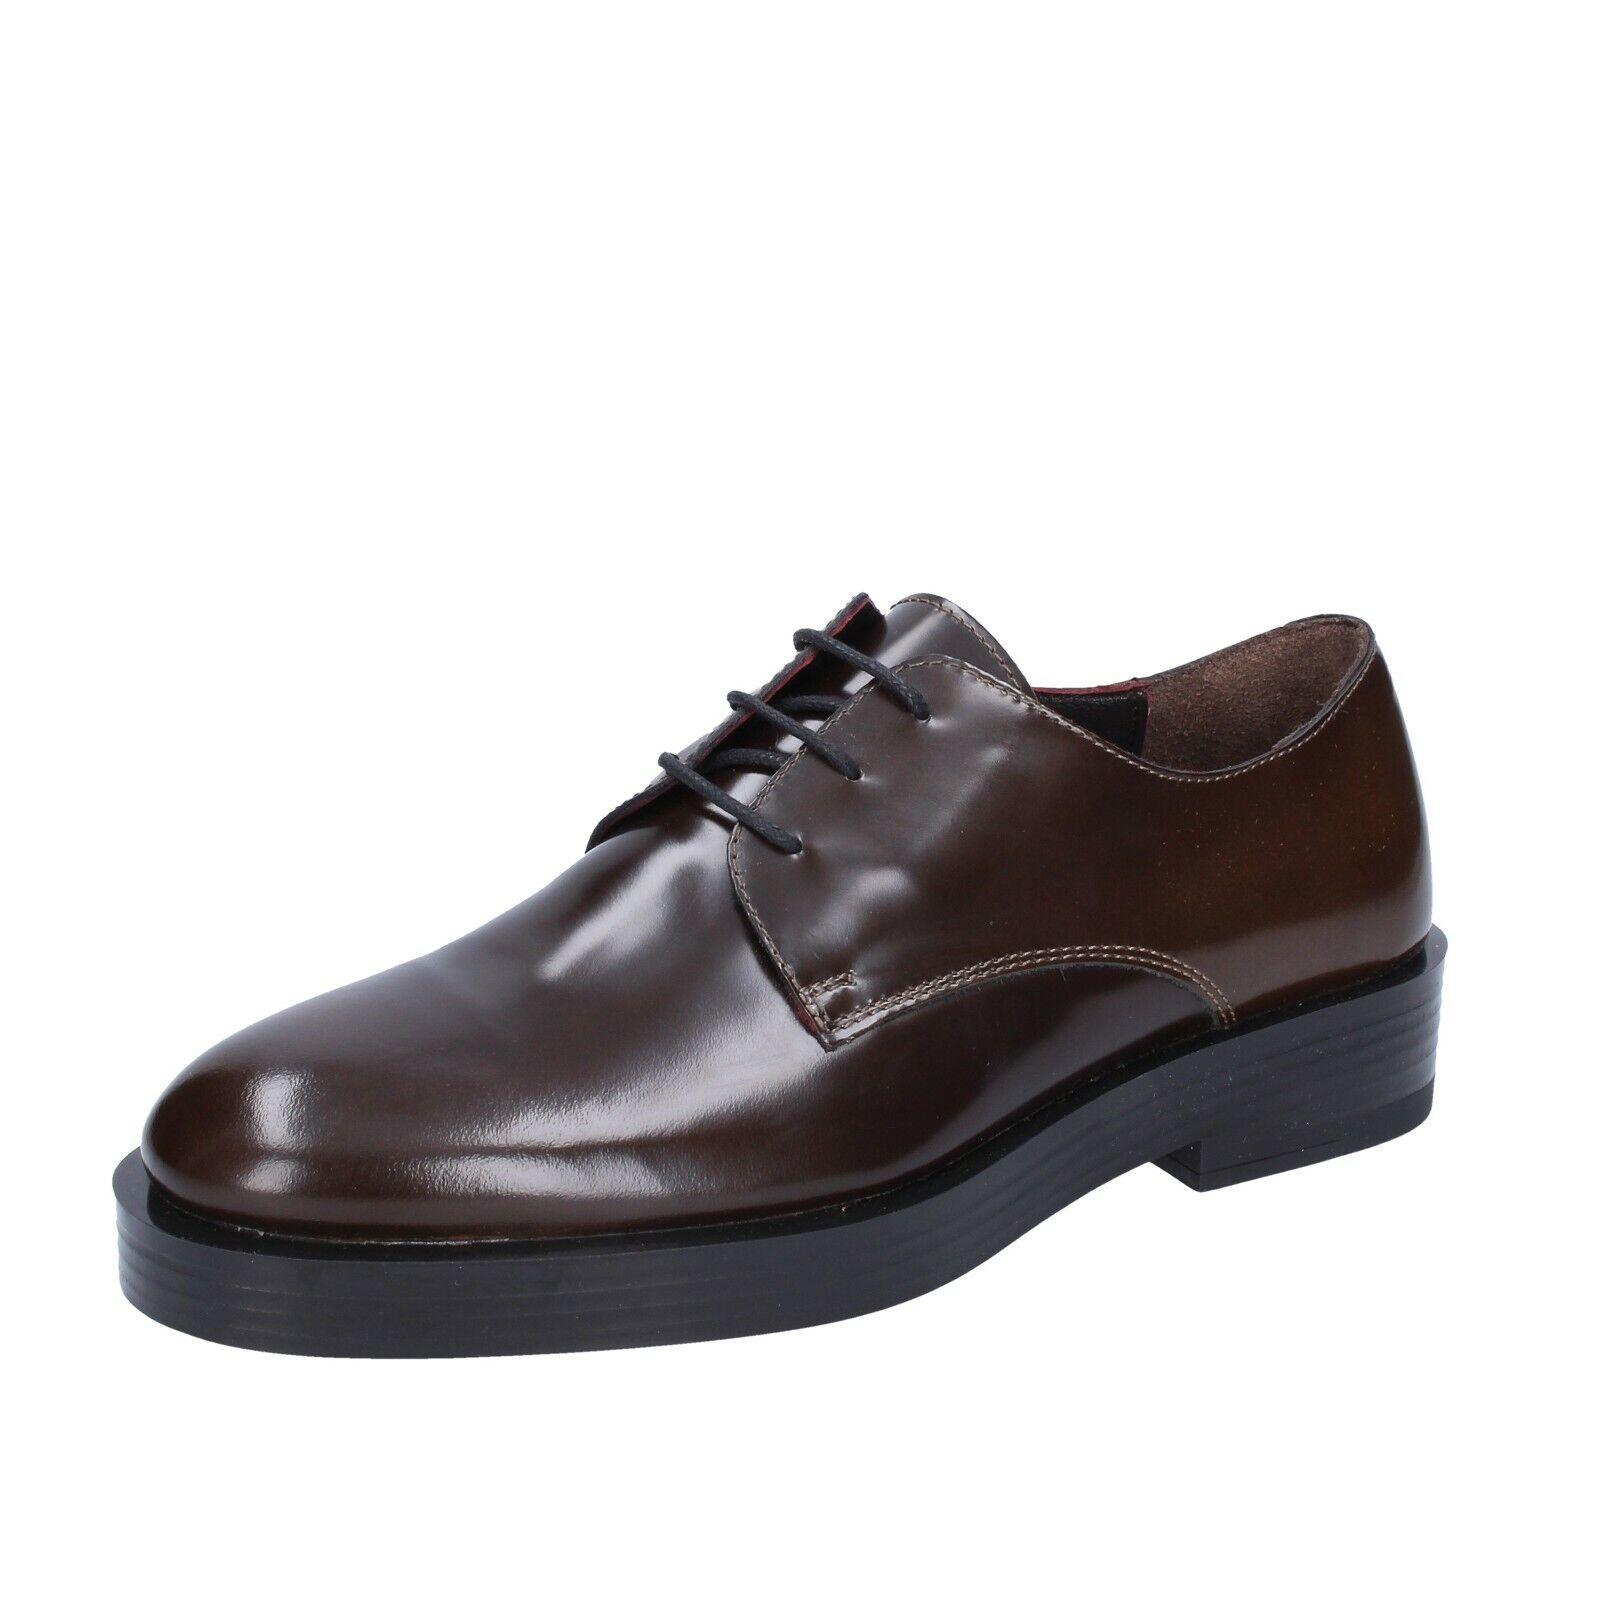 Chaussures femmes TRIVER FLIGHT 36 UE élégante marron gros cuir br72-36